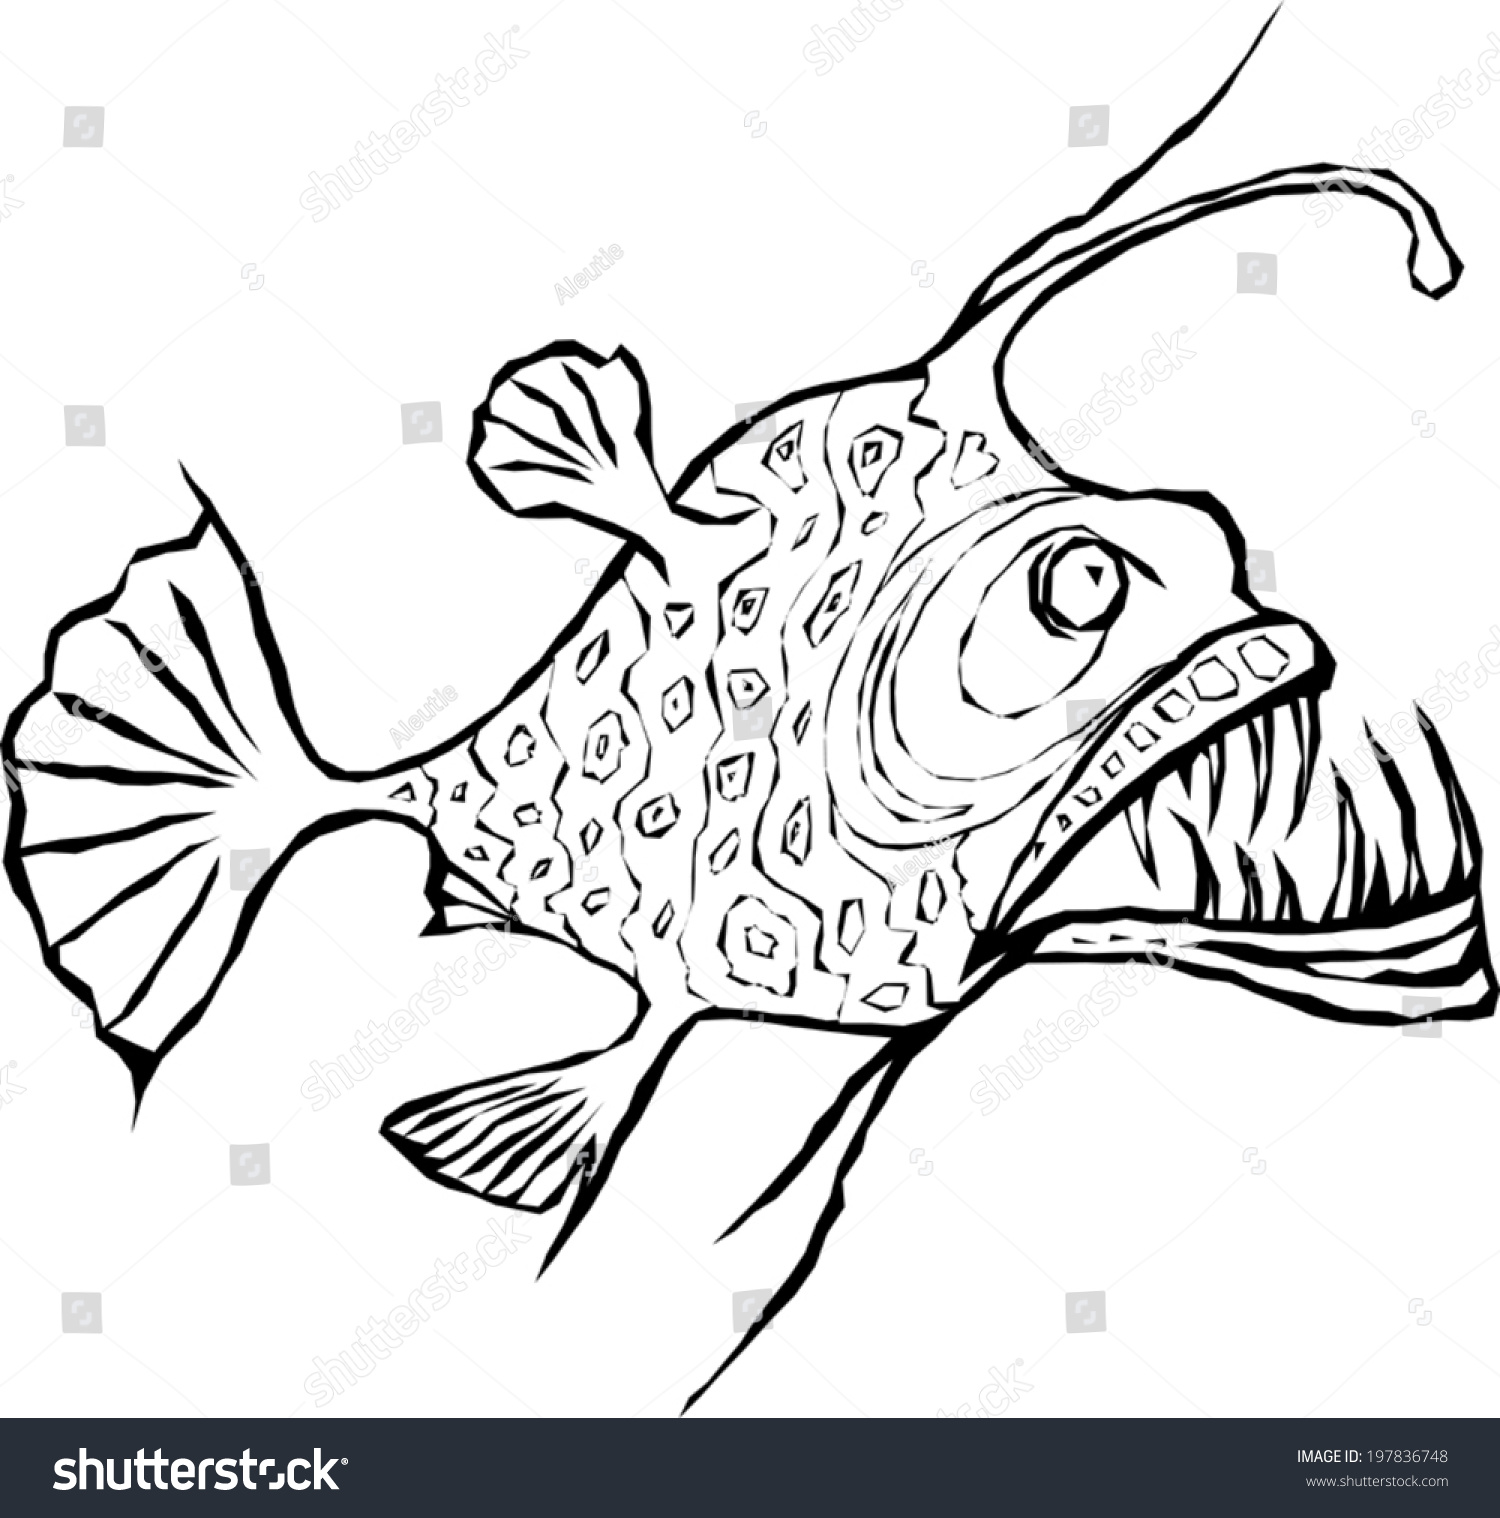 1500x1518 Angler Fish Skeleton Drawing Realistic Cartoon Easy Tutorial